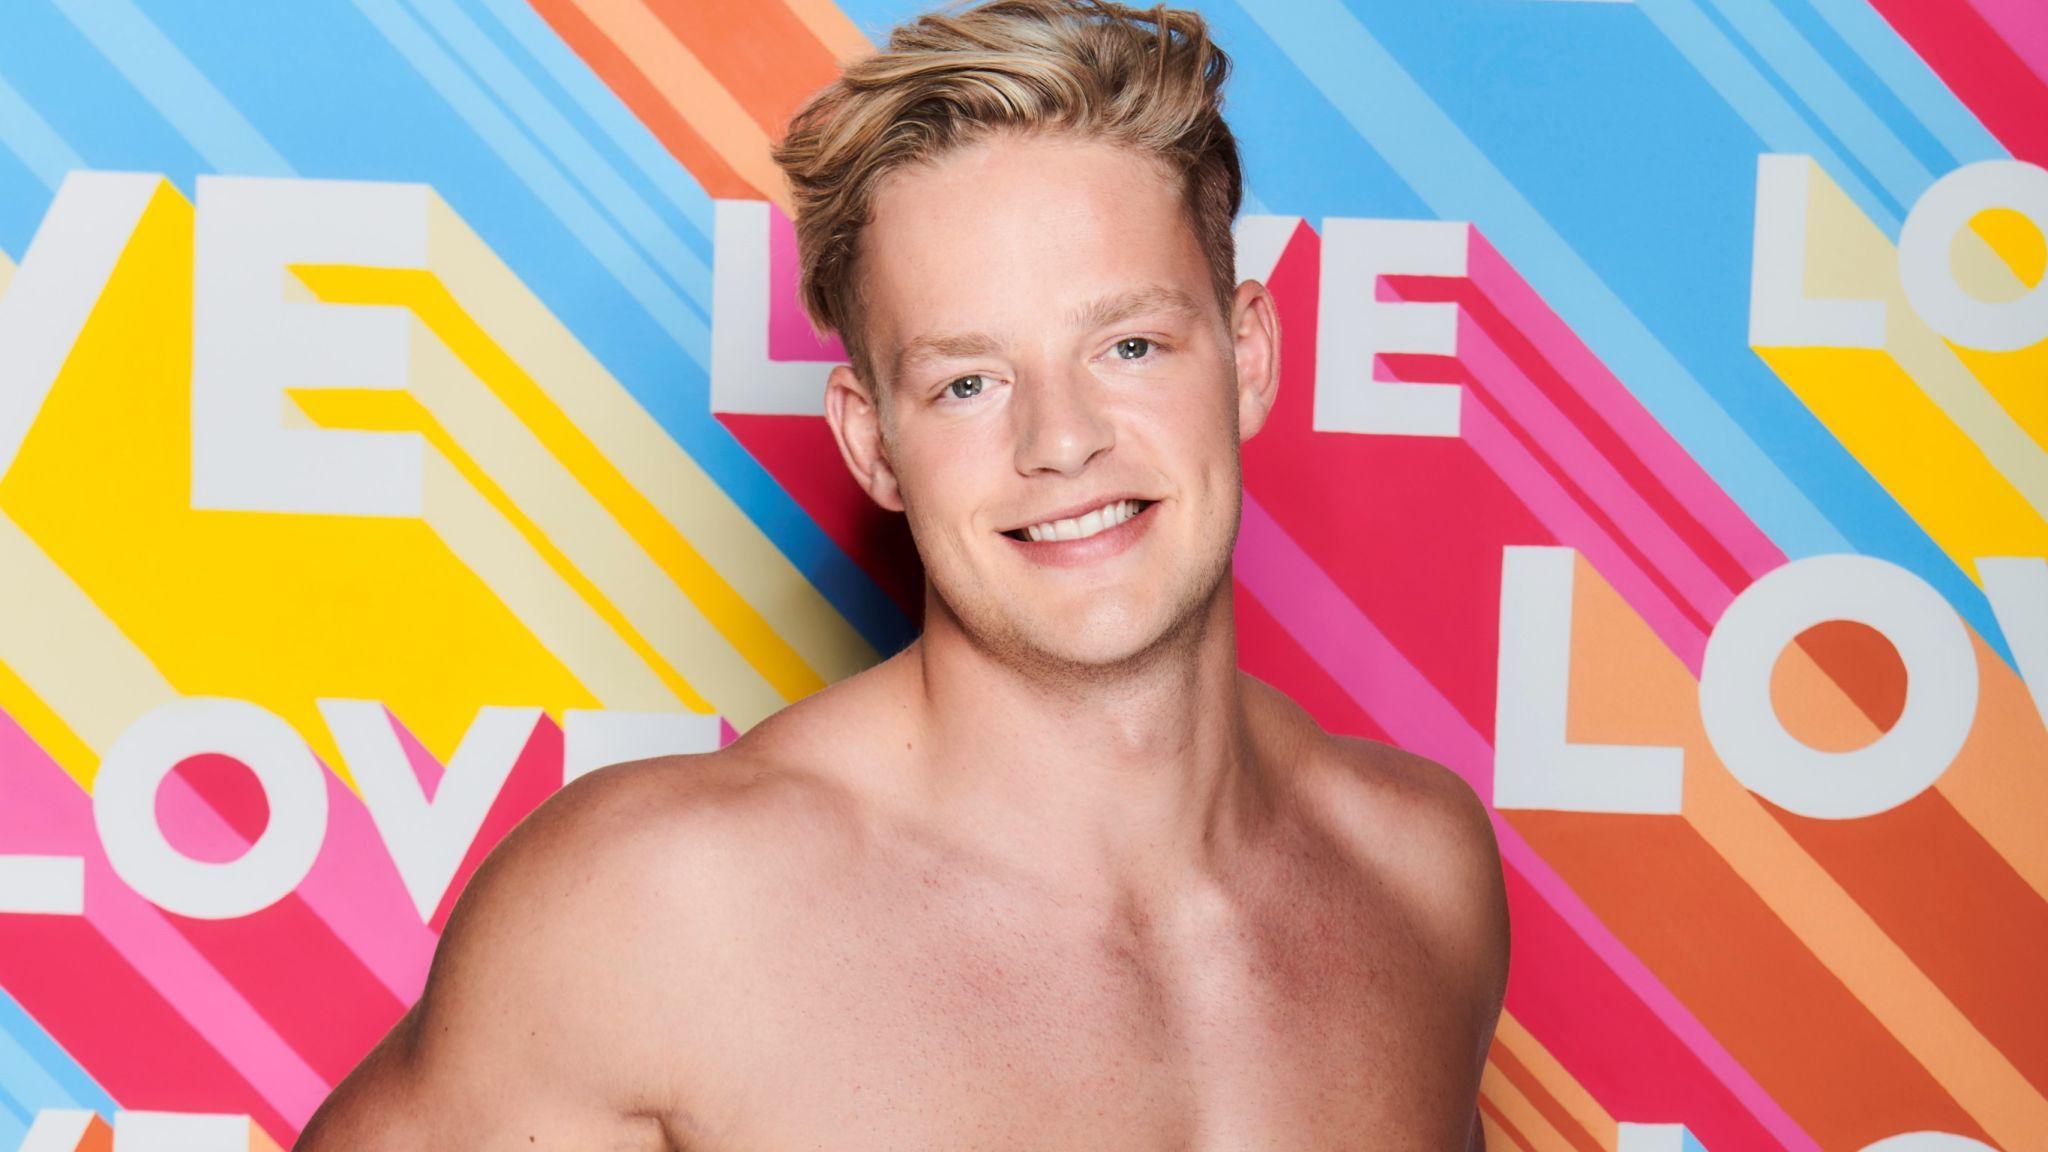 Love Island winter 2020 contestant Ollie Williams. Pic: ITV